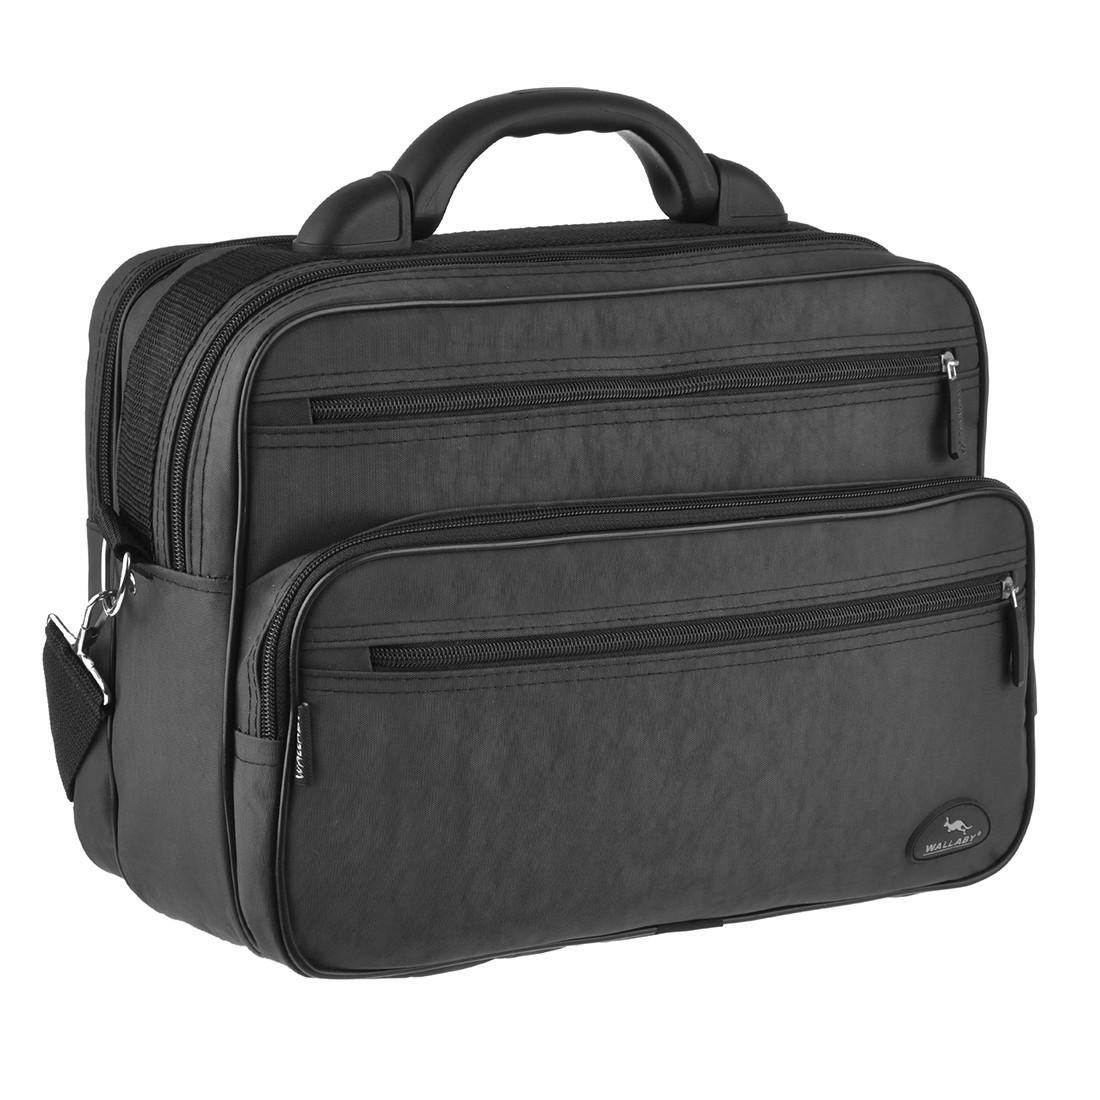 Мужская сумка Wallaby полу каркас 36х26х16 ткань чёрный кринкл, ручка пластиковая  в 26531ч